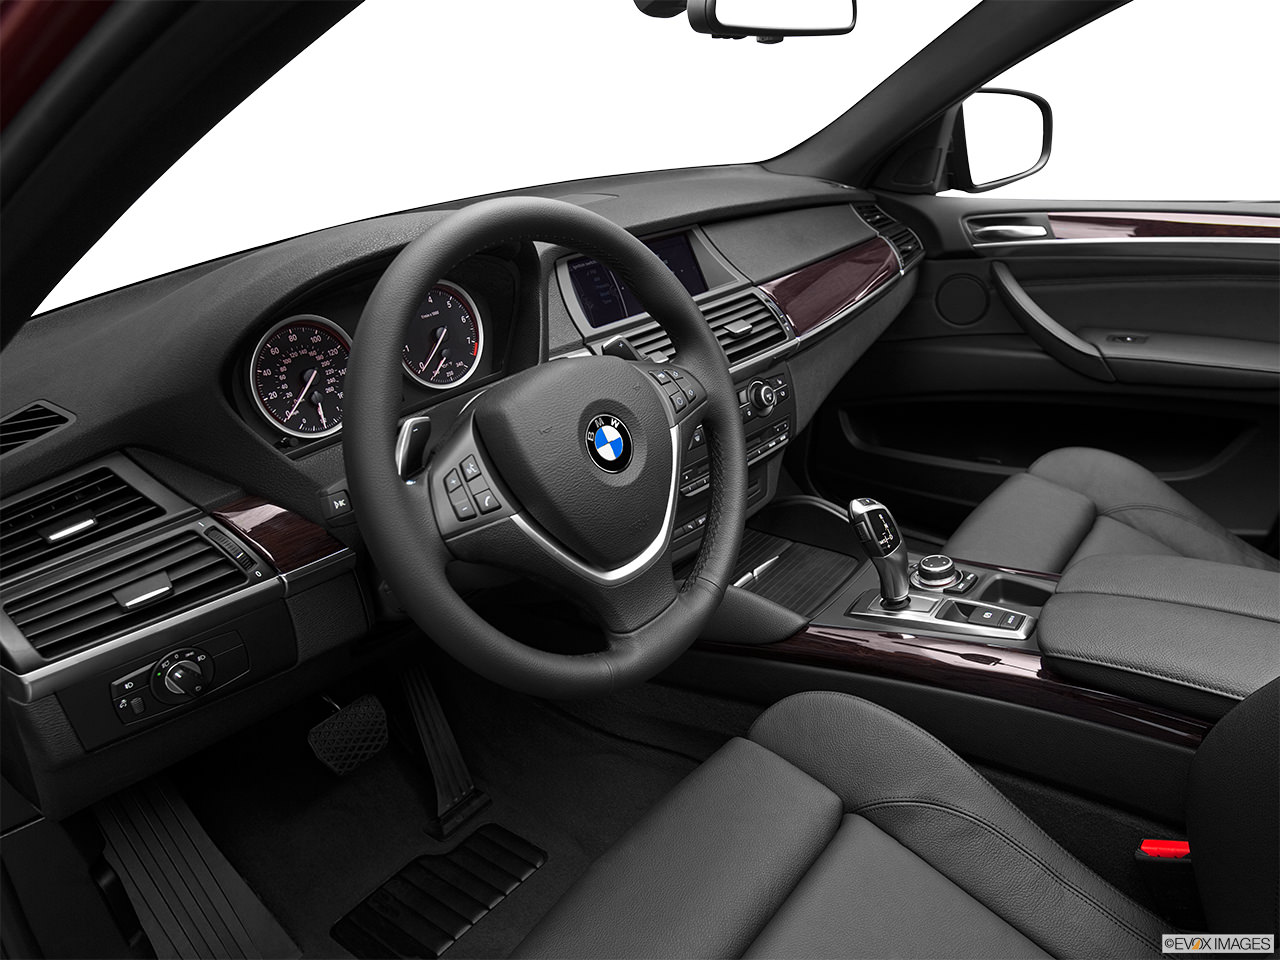 BMW X6 2012 Interior